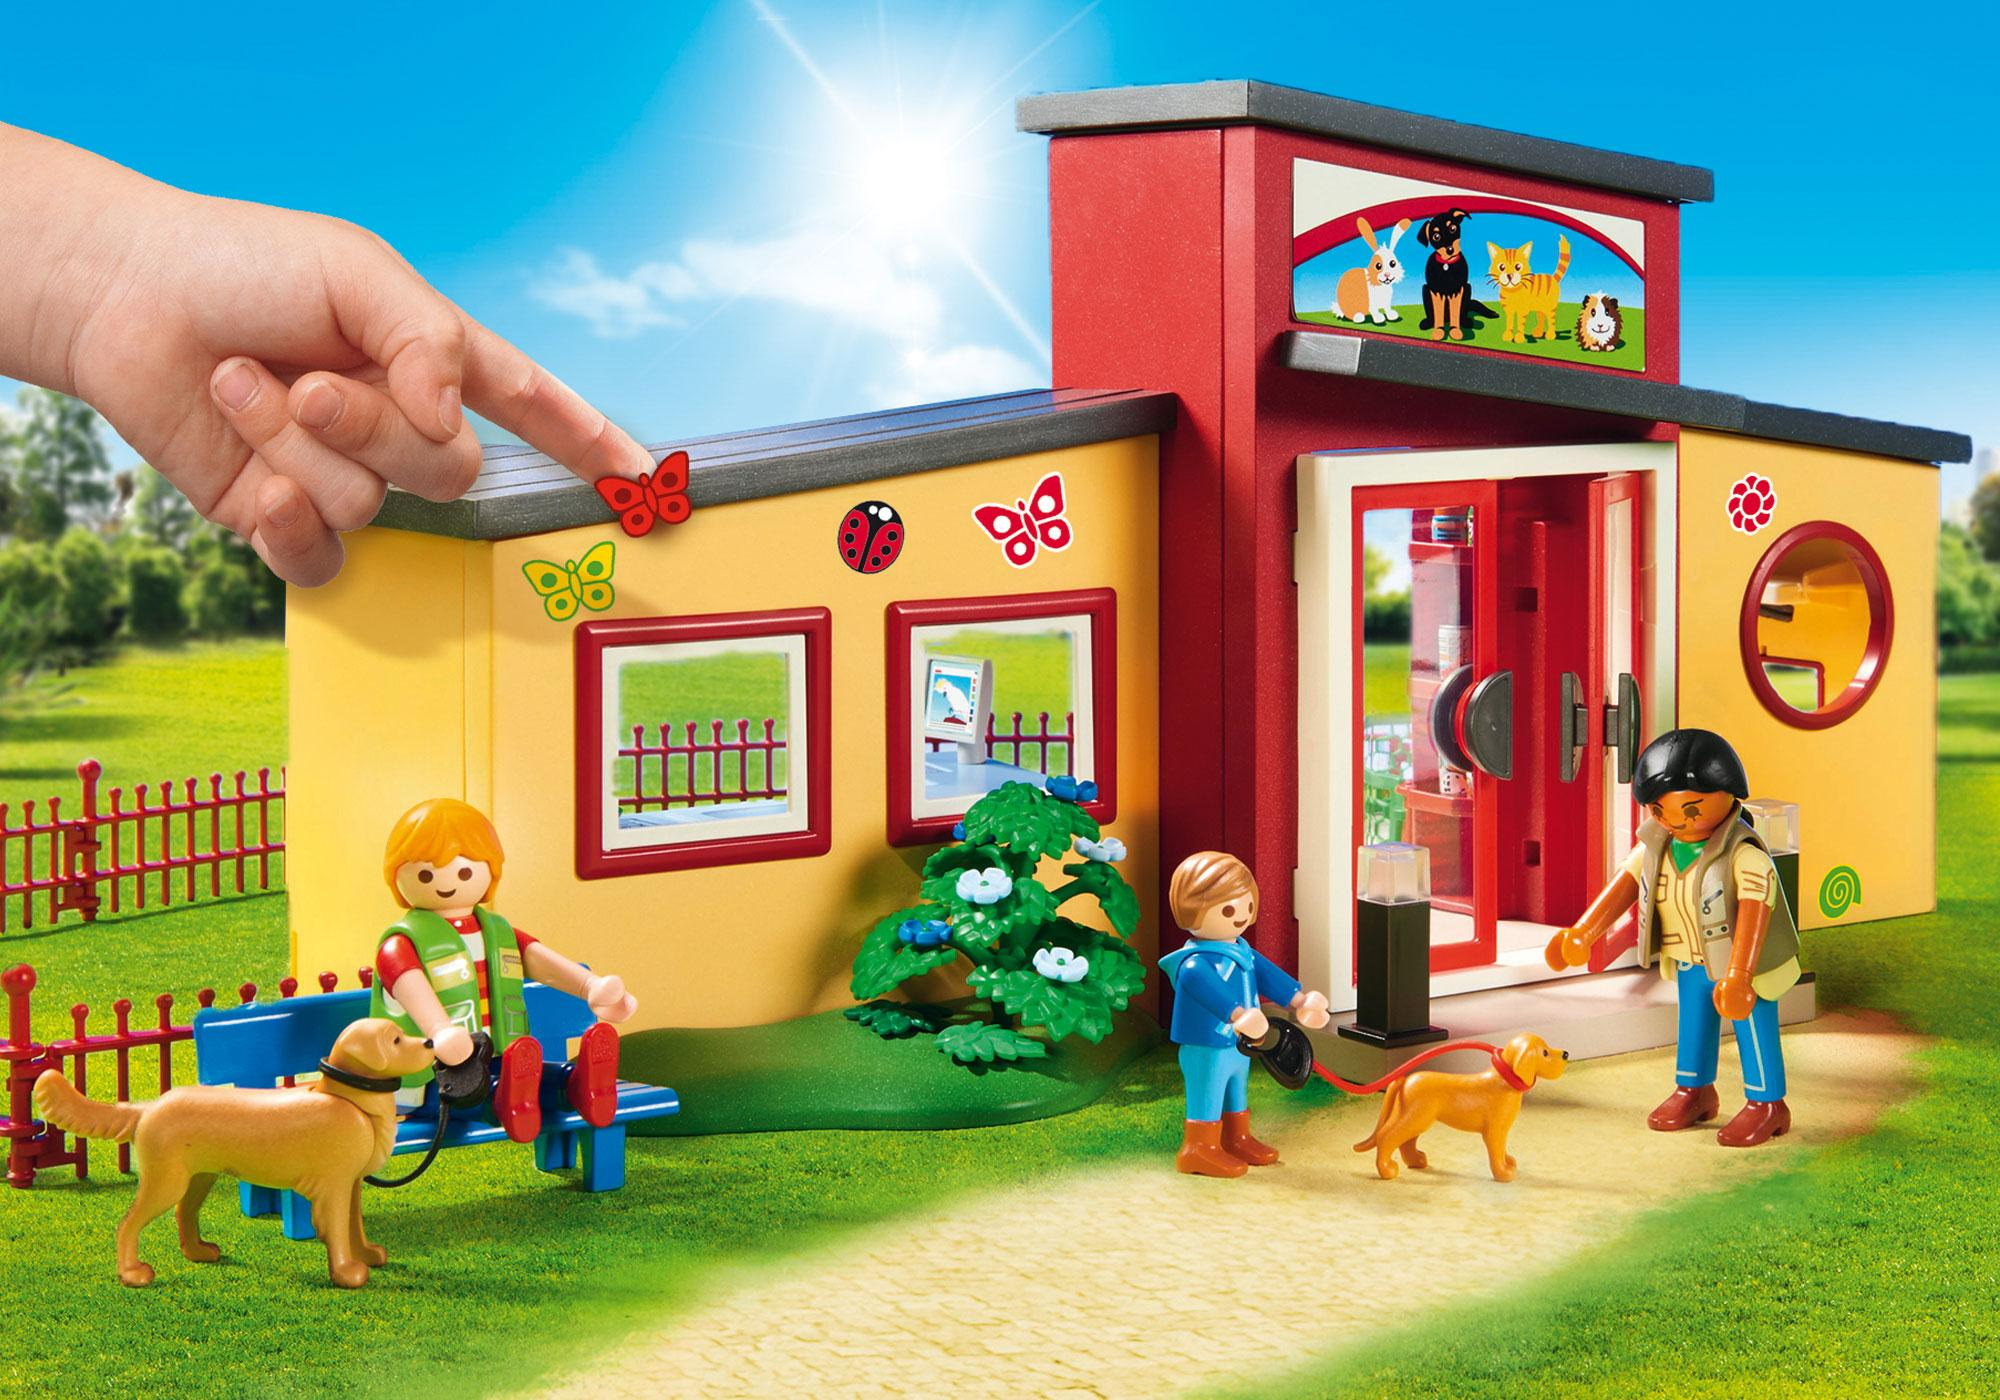 http://media.playmobil.com/i/playmobil/9275_product_extra2/Tiny Paws Pet Hotel